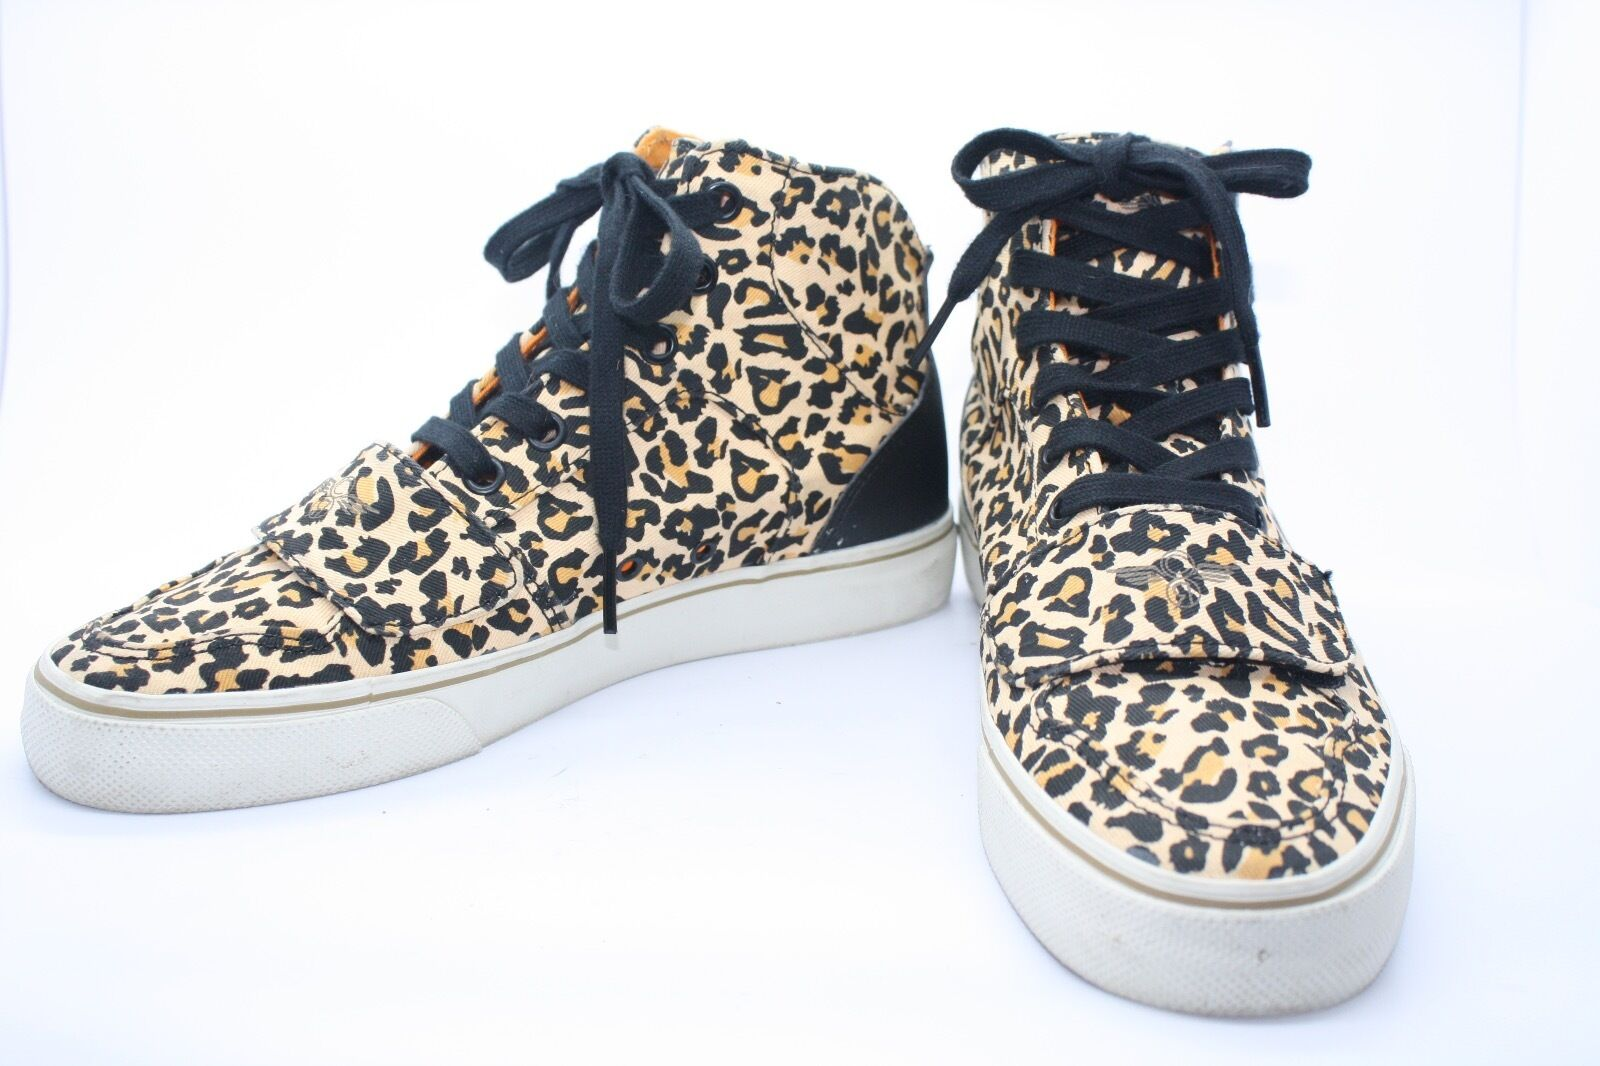 CREATIVE RECREATION Ivory Cesario XVI Cheetah Animal Print Hightop shoes Size 7